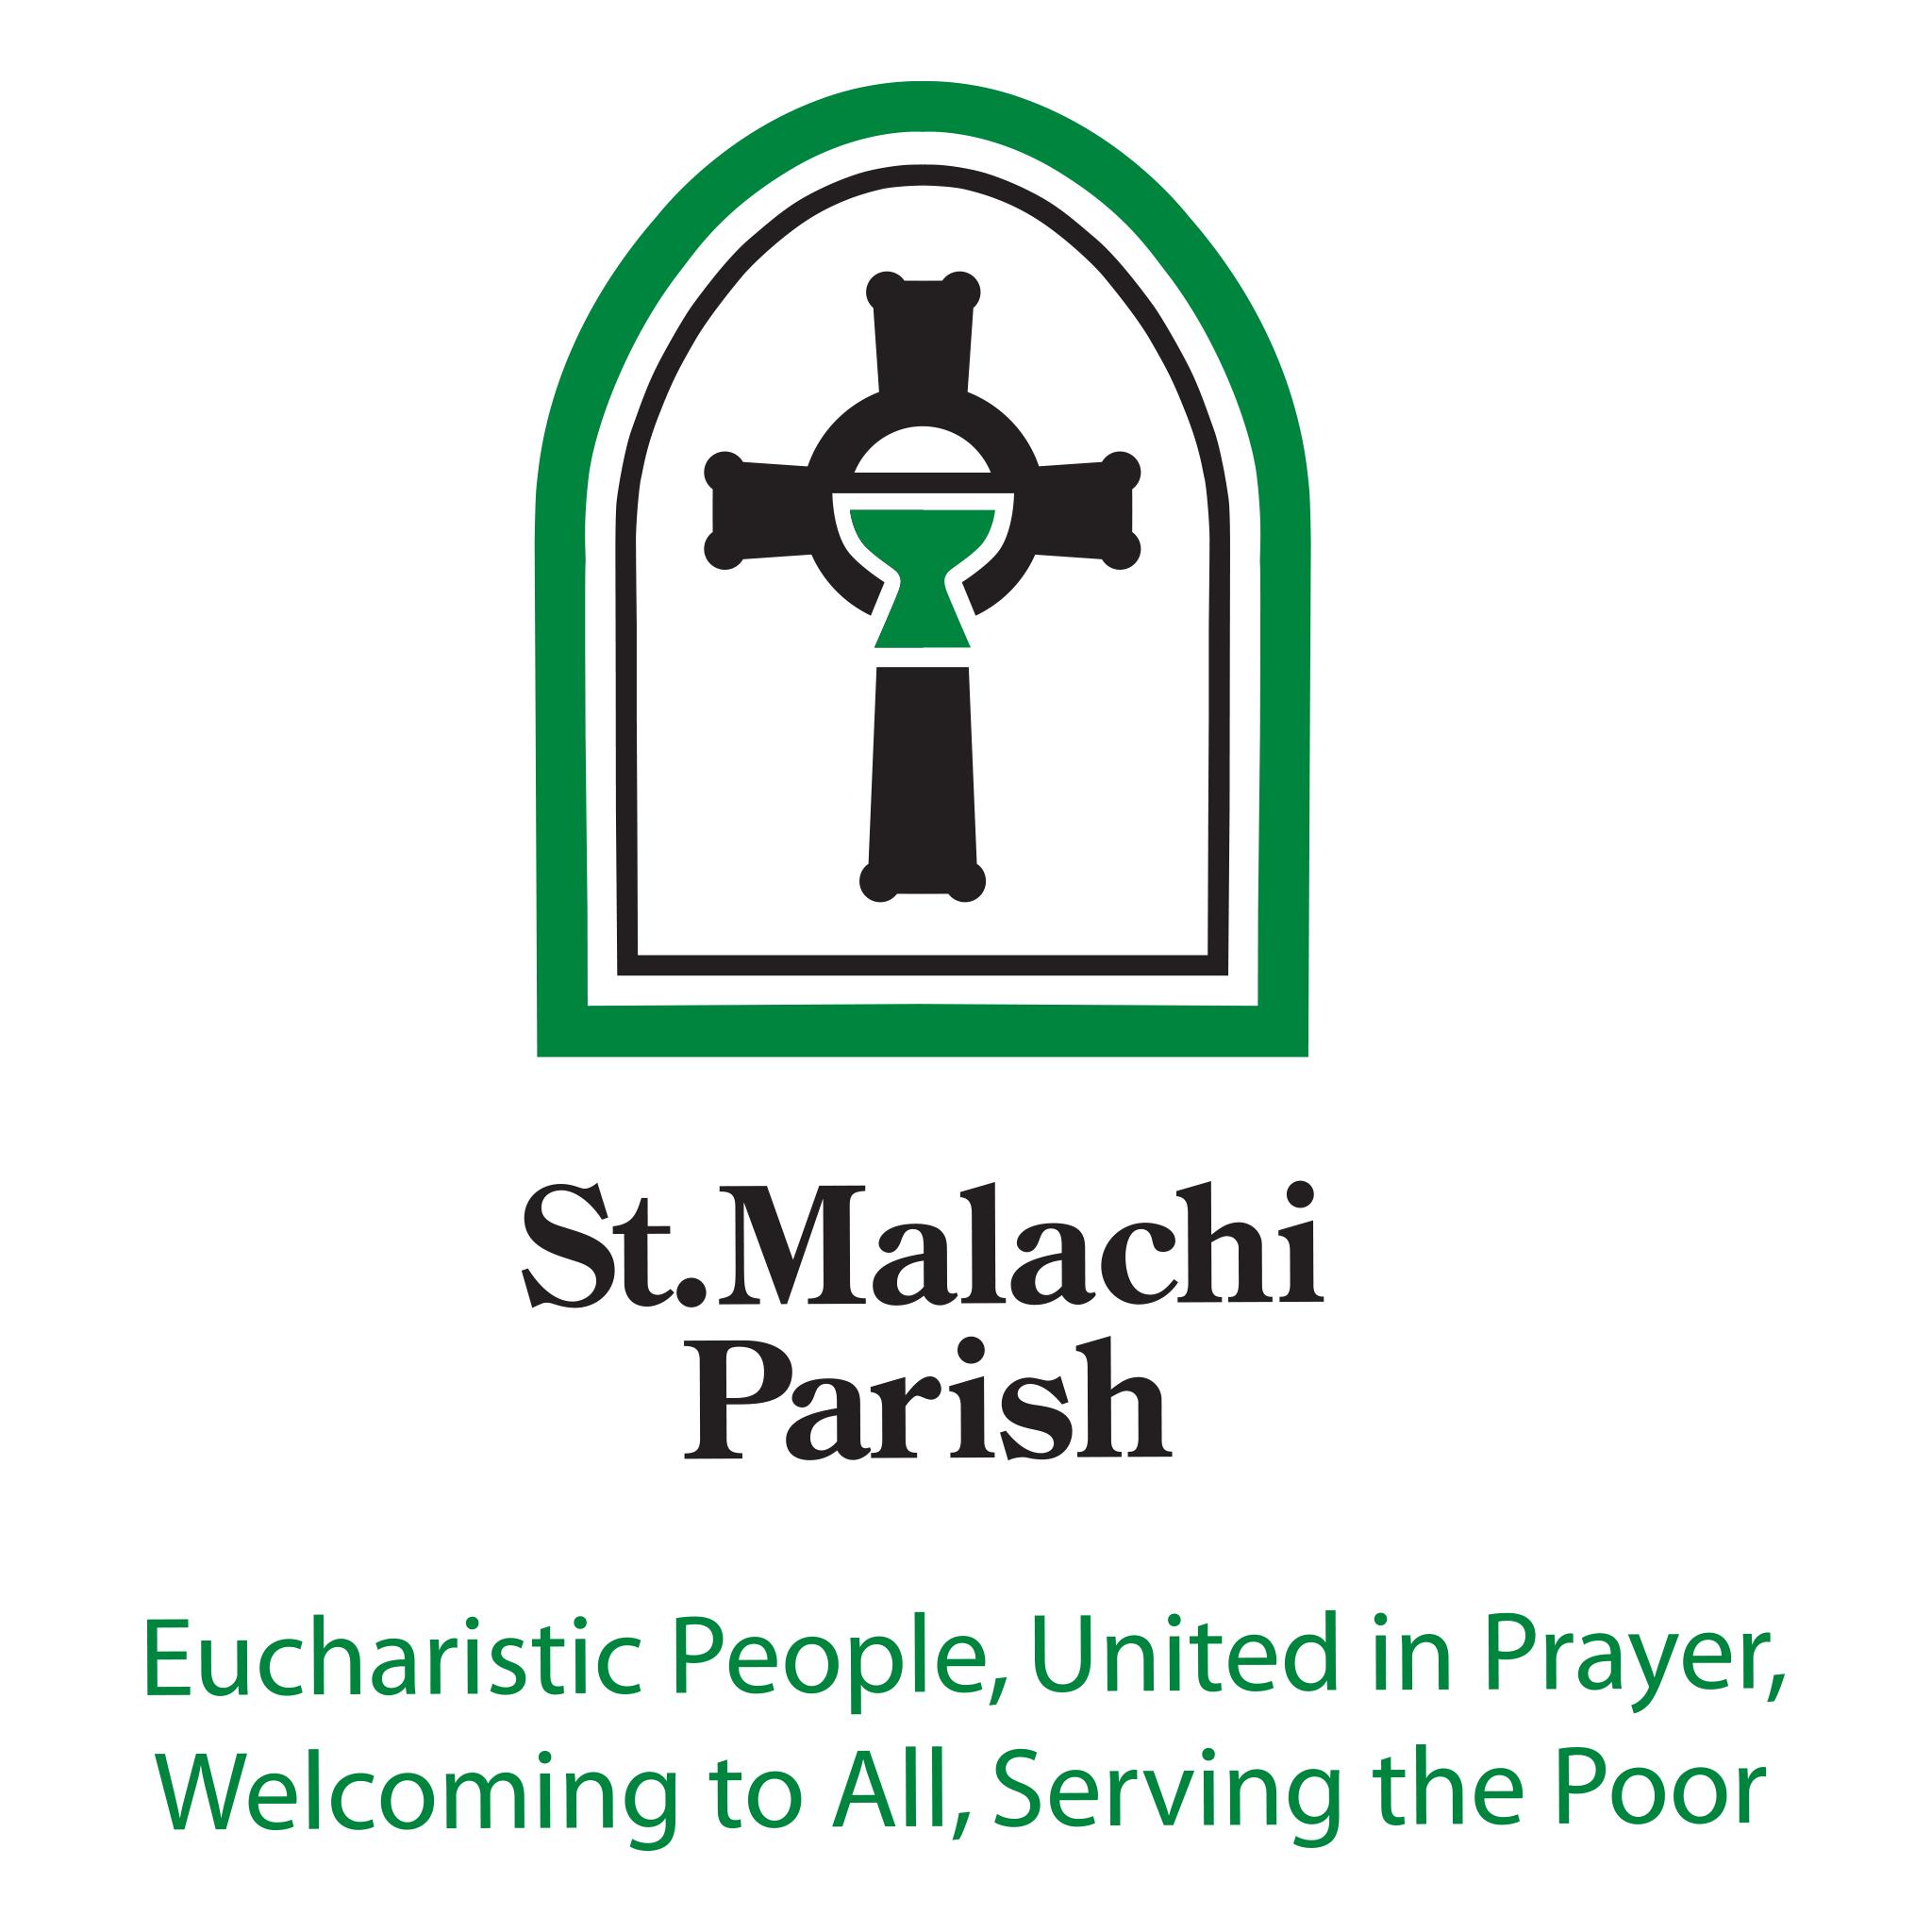 St. Malachi Parish Homilies